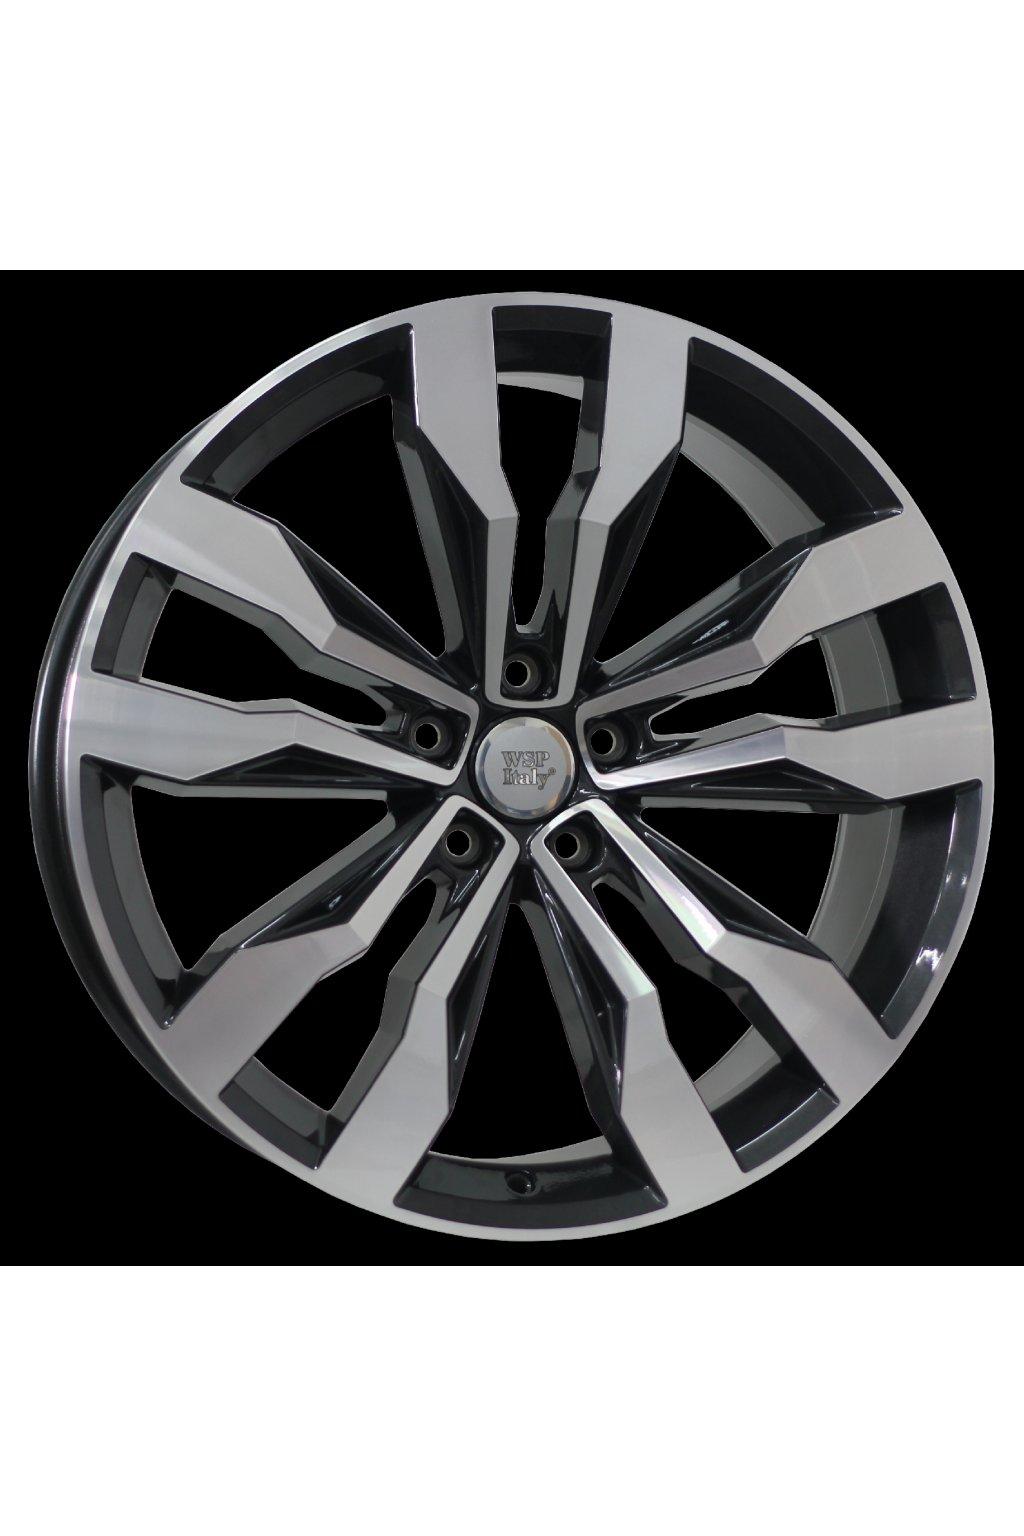 WSP VW COBRA 8.5x20.0 ET38 5x112 GLOSSY BLACK POLISHED